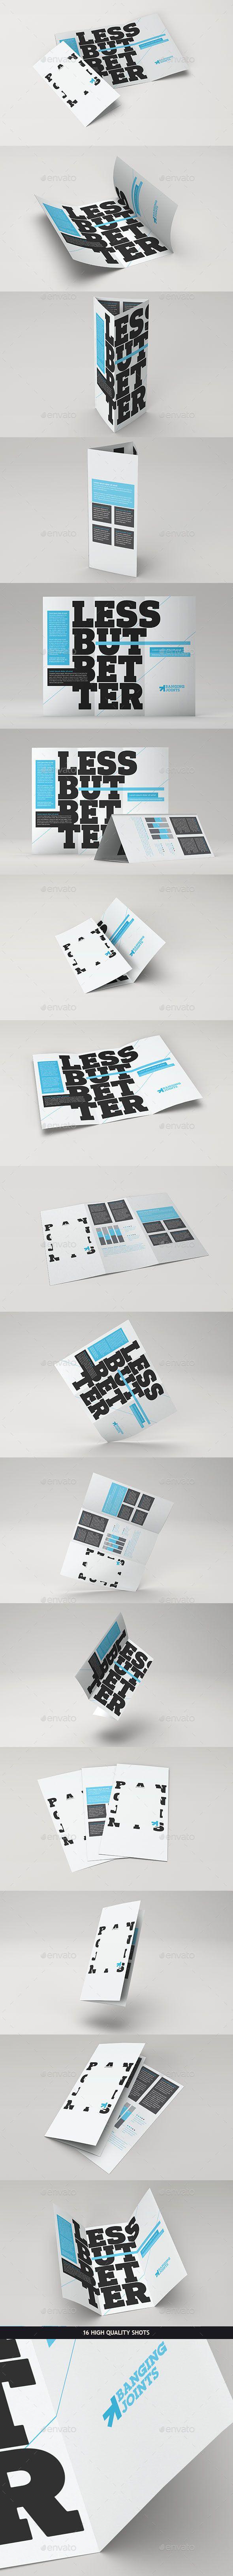 Trifold Brochure Mock-Up Pack | Download: http://graphicriver.net/item/trifold-brochure-mockup-pack/10116678?ref=ksioks